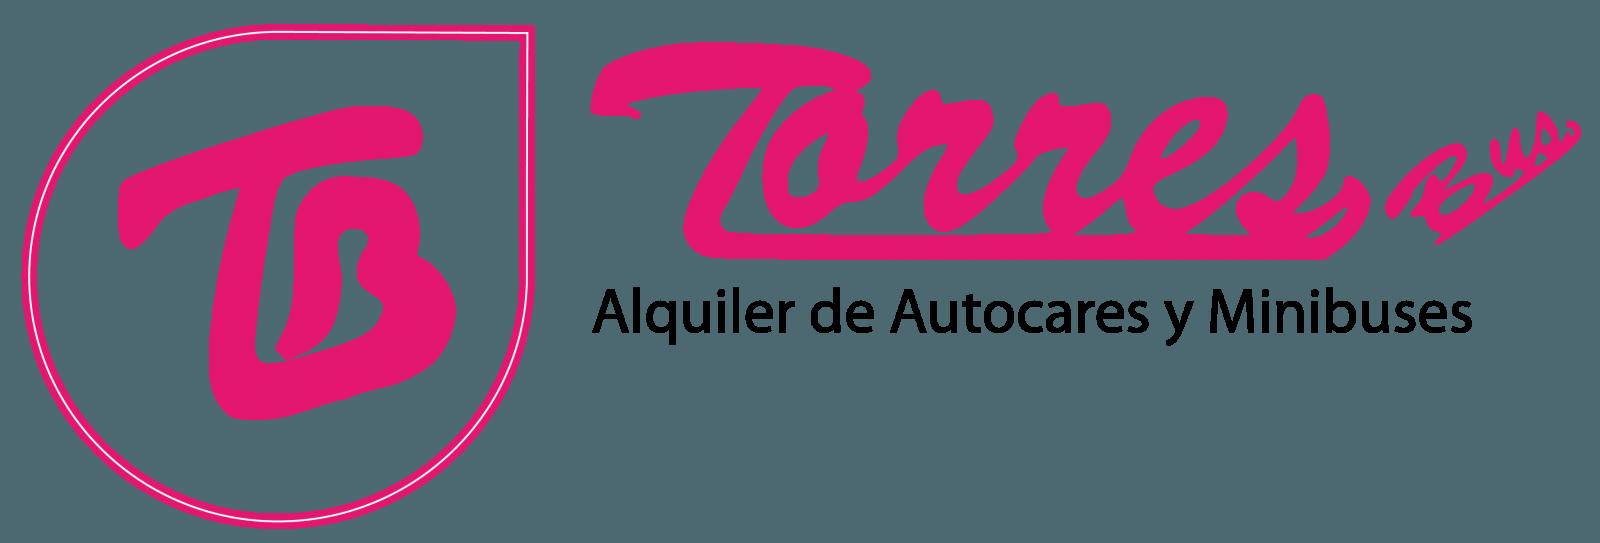 Аренда автобусов, автобусов, микроавтобусов и микроавтобусов в Мадриде